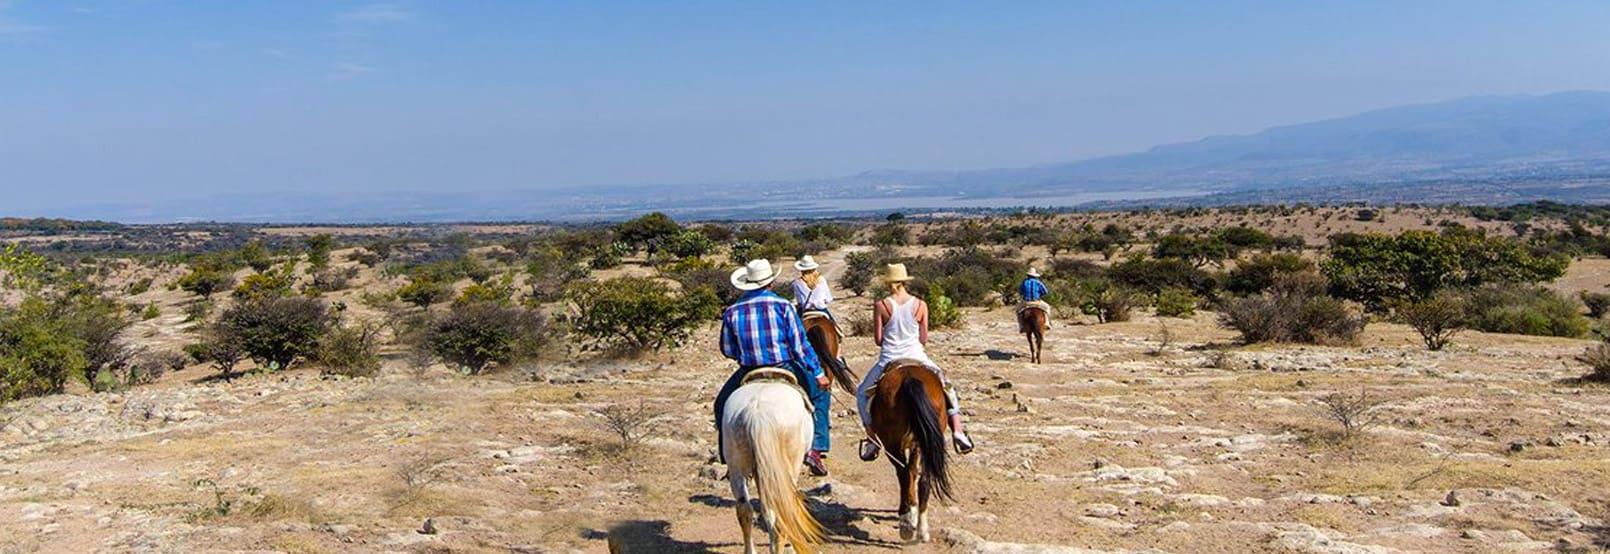 Horseback Riding in Guanajuato